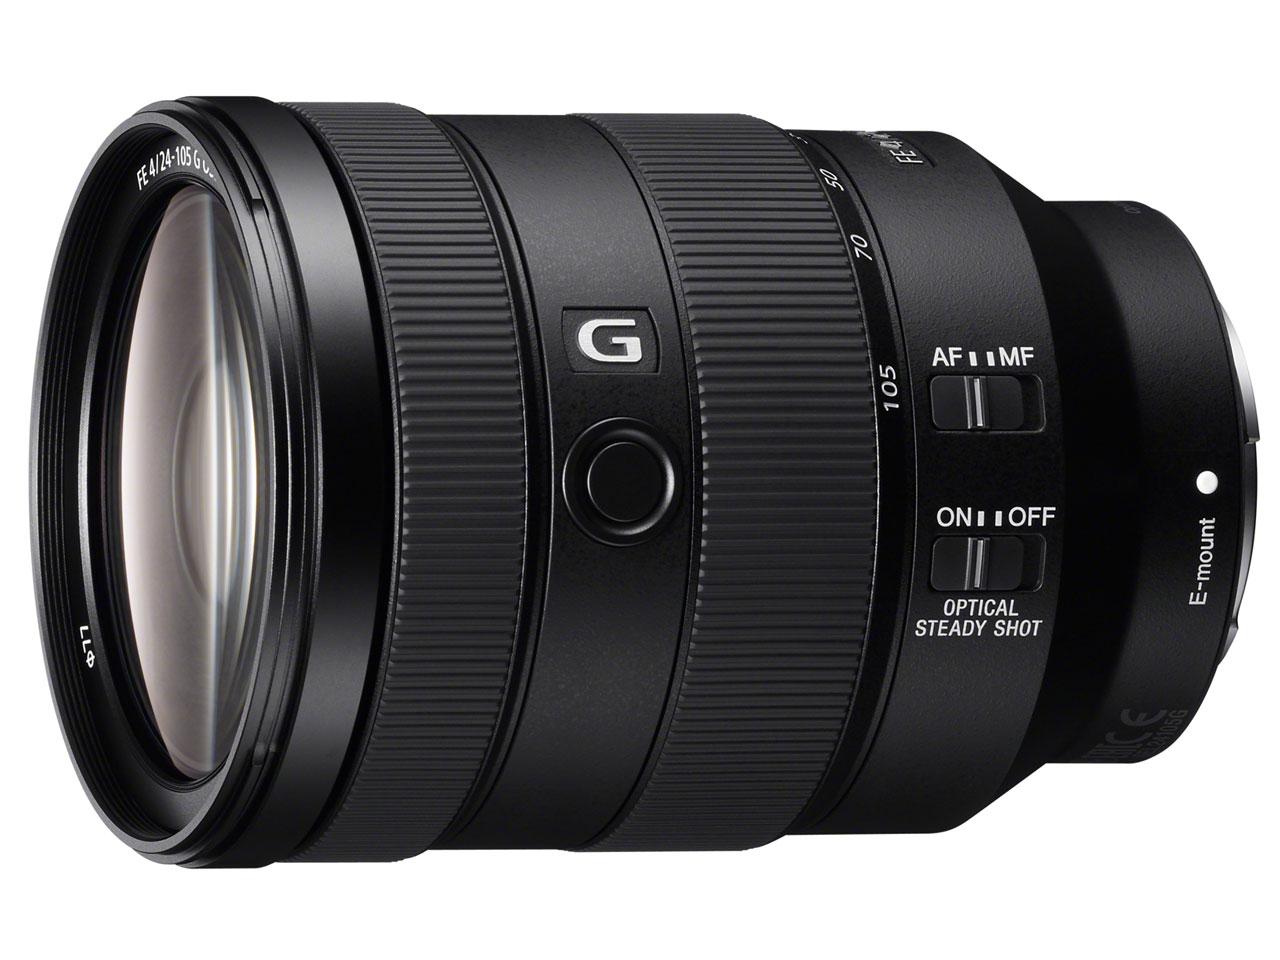 FE 24-105mm F4 G OSS SEL24105G の製品画像